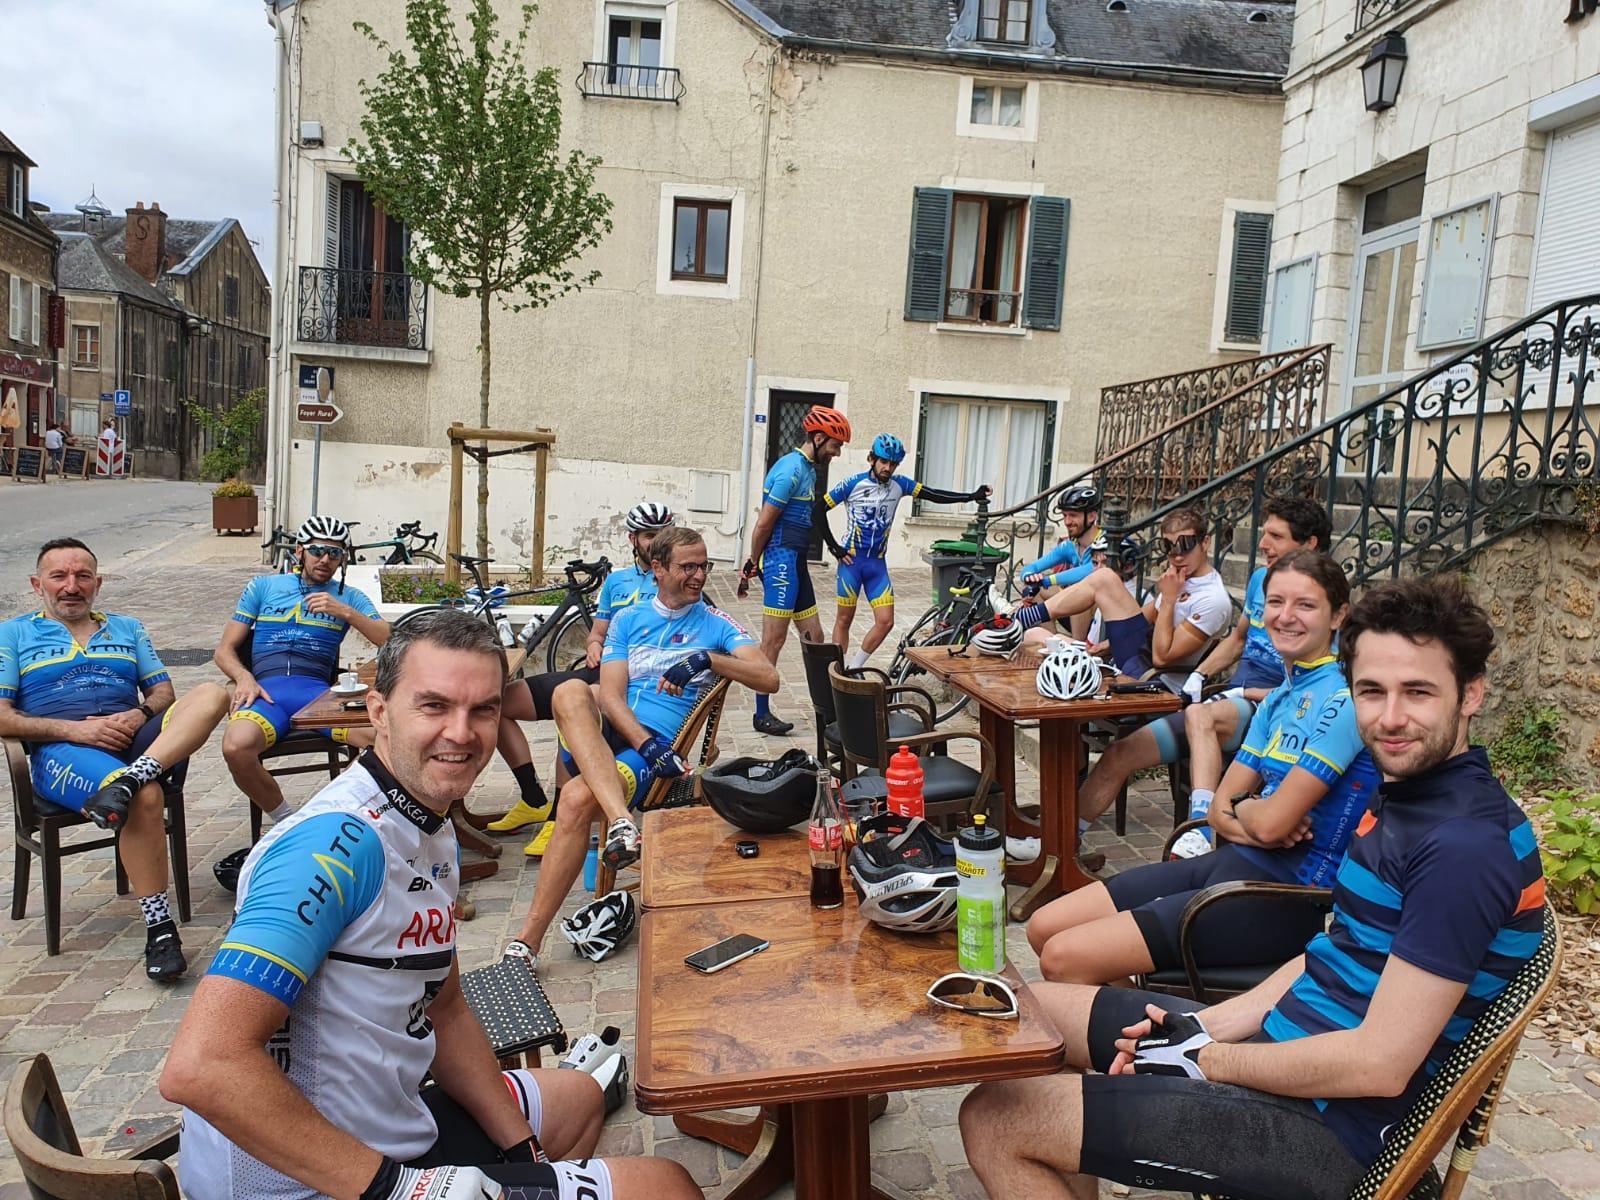 https://teamchatoucyclisme.com/wp-content/uploads/2020/07/107518072_1068066550256796_8715538716835409245_o.jpg